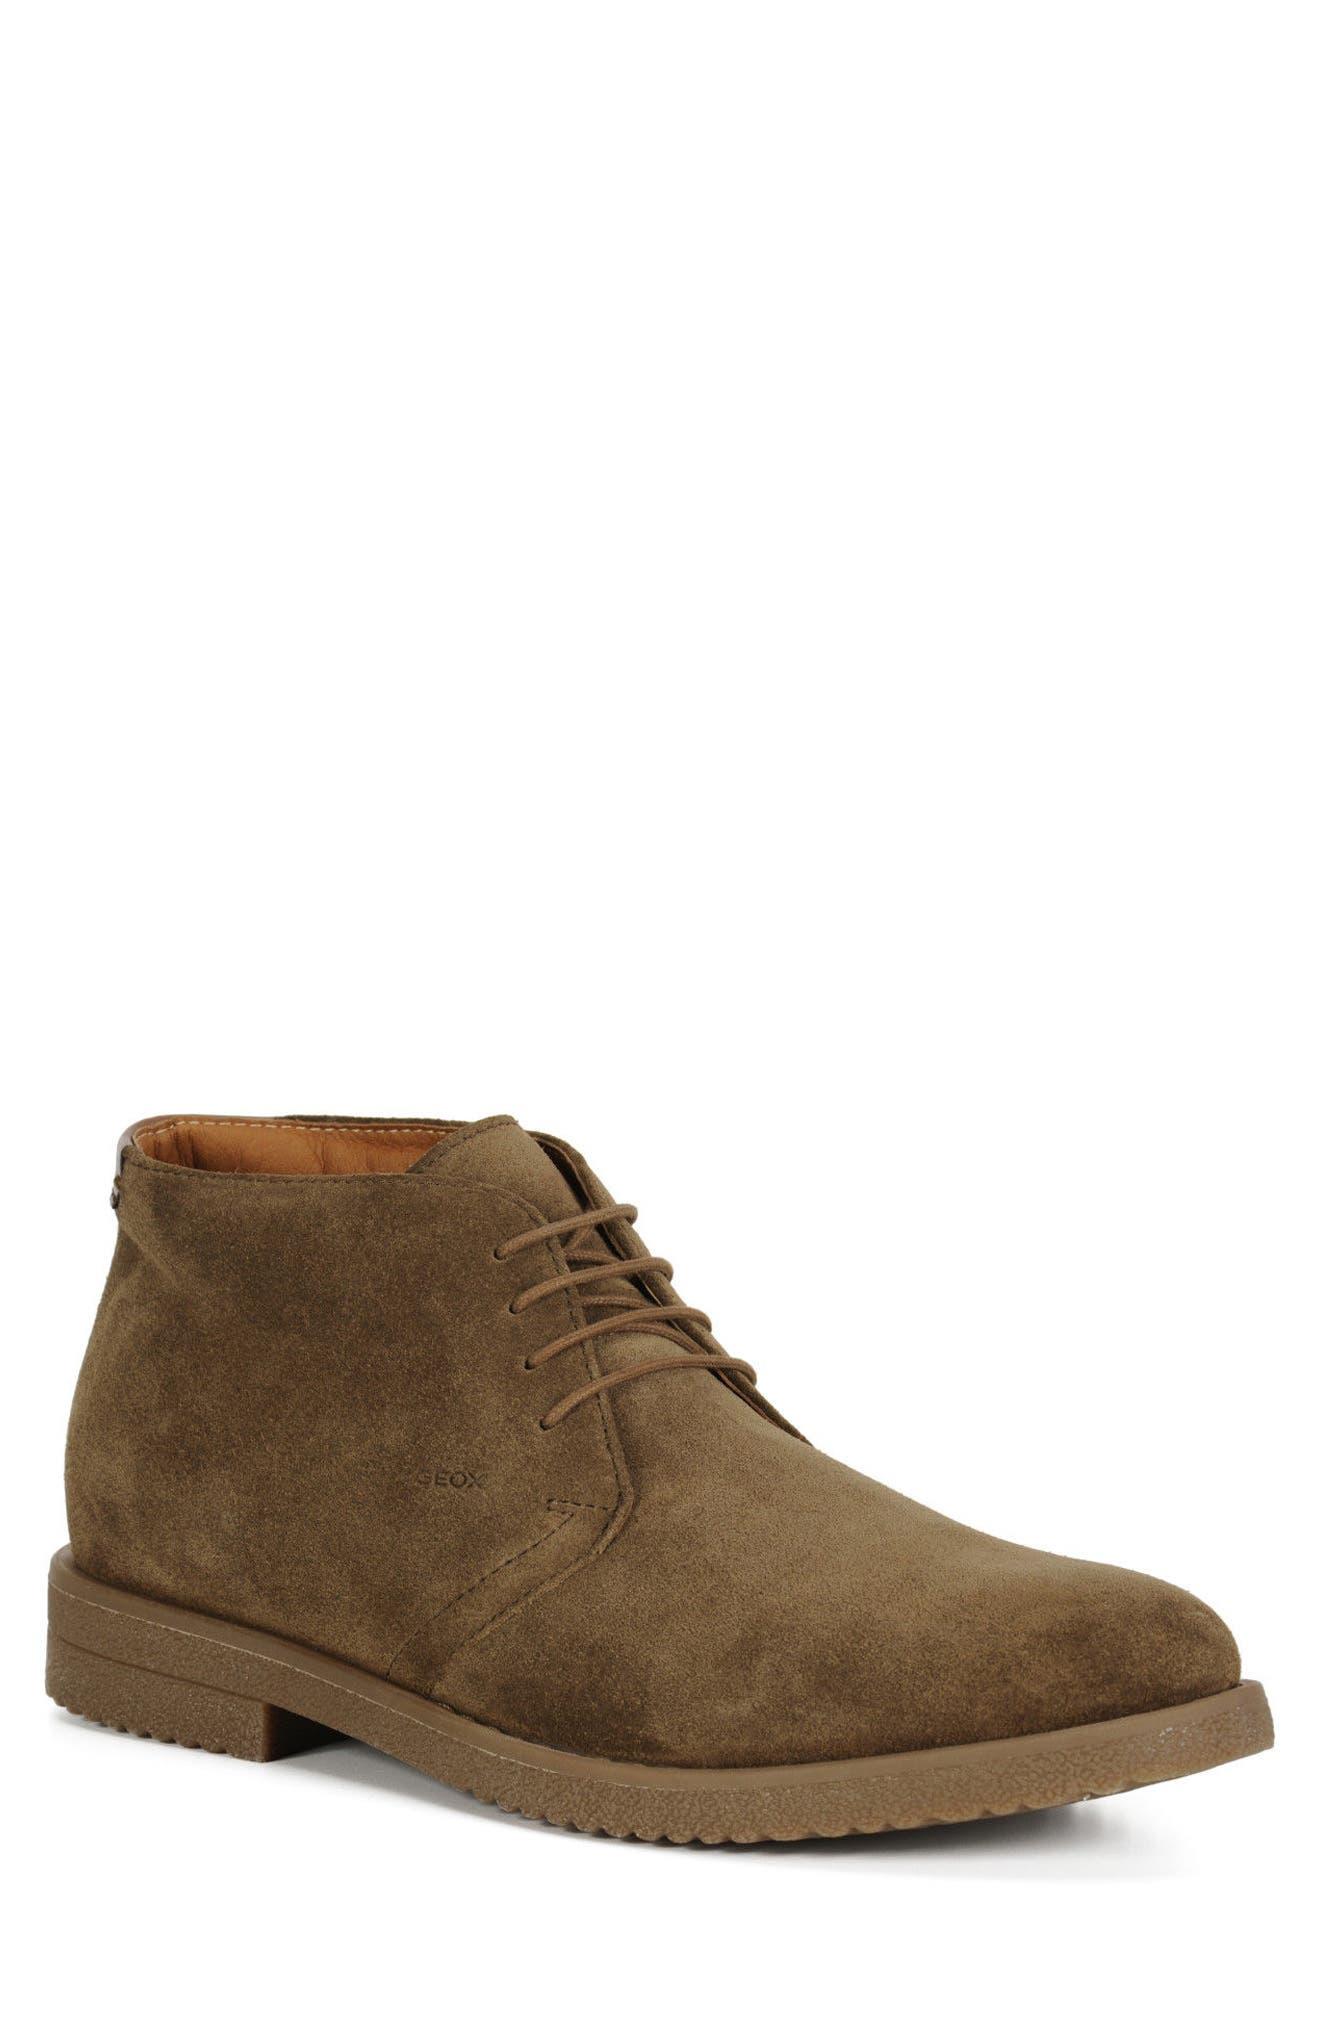 Geox Brandled Chukka Boot (Men)